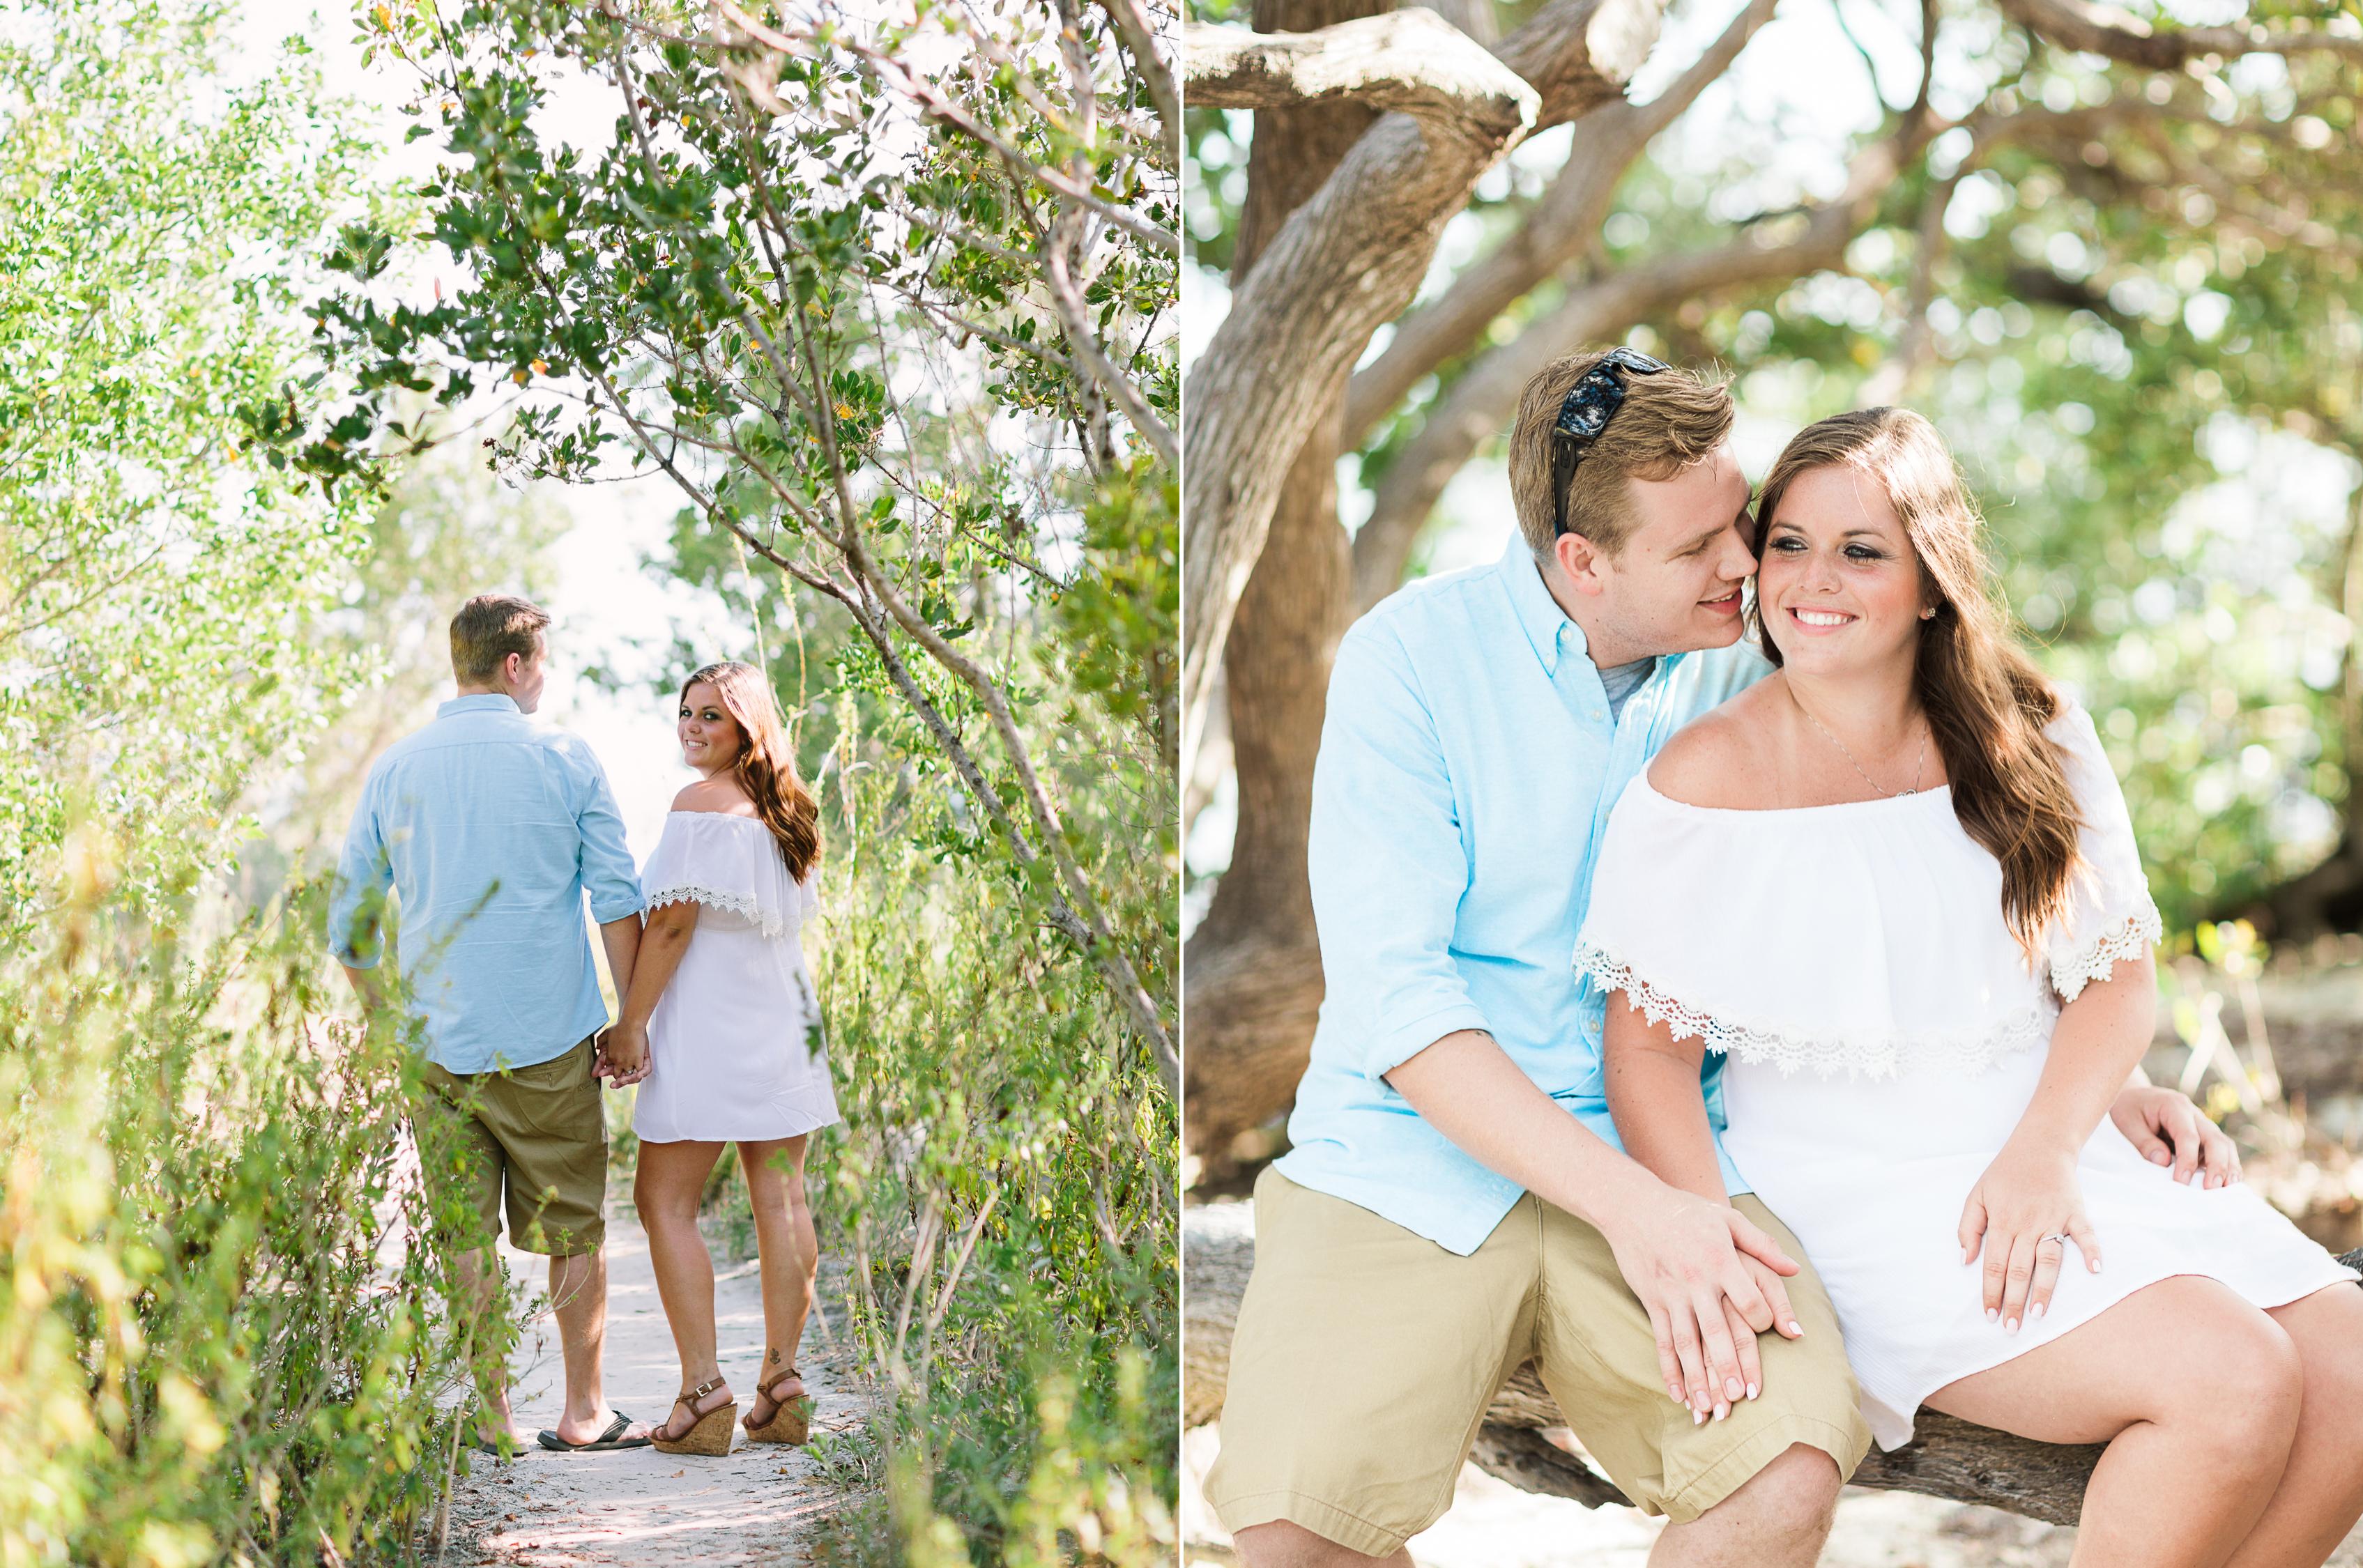 Islamorada Engagement session, Islamorada Florida Weddings, Islamorada photographer, Florida Keys photographers